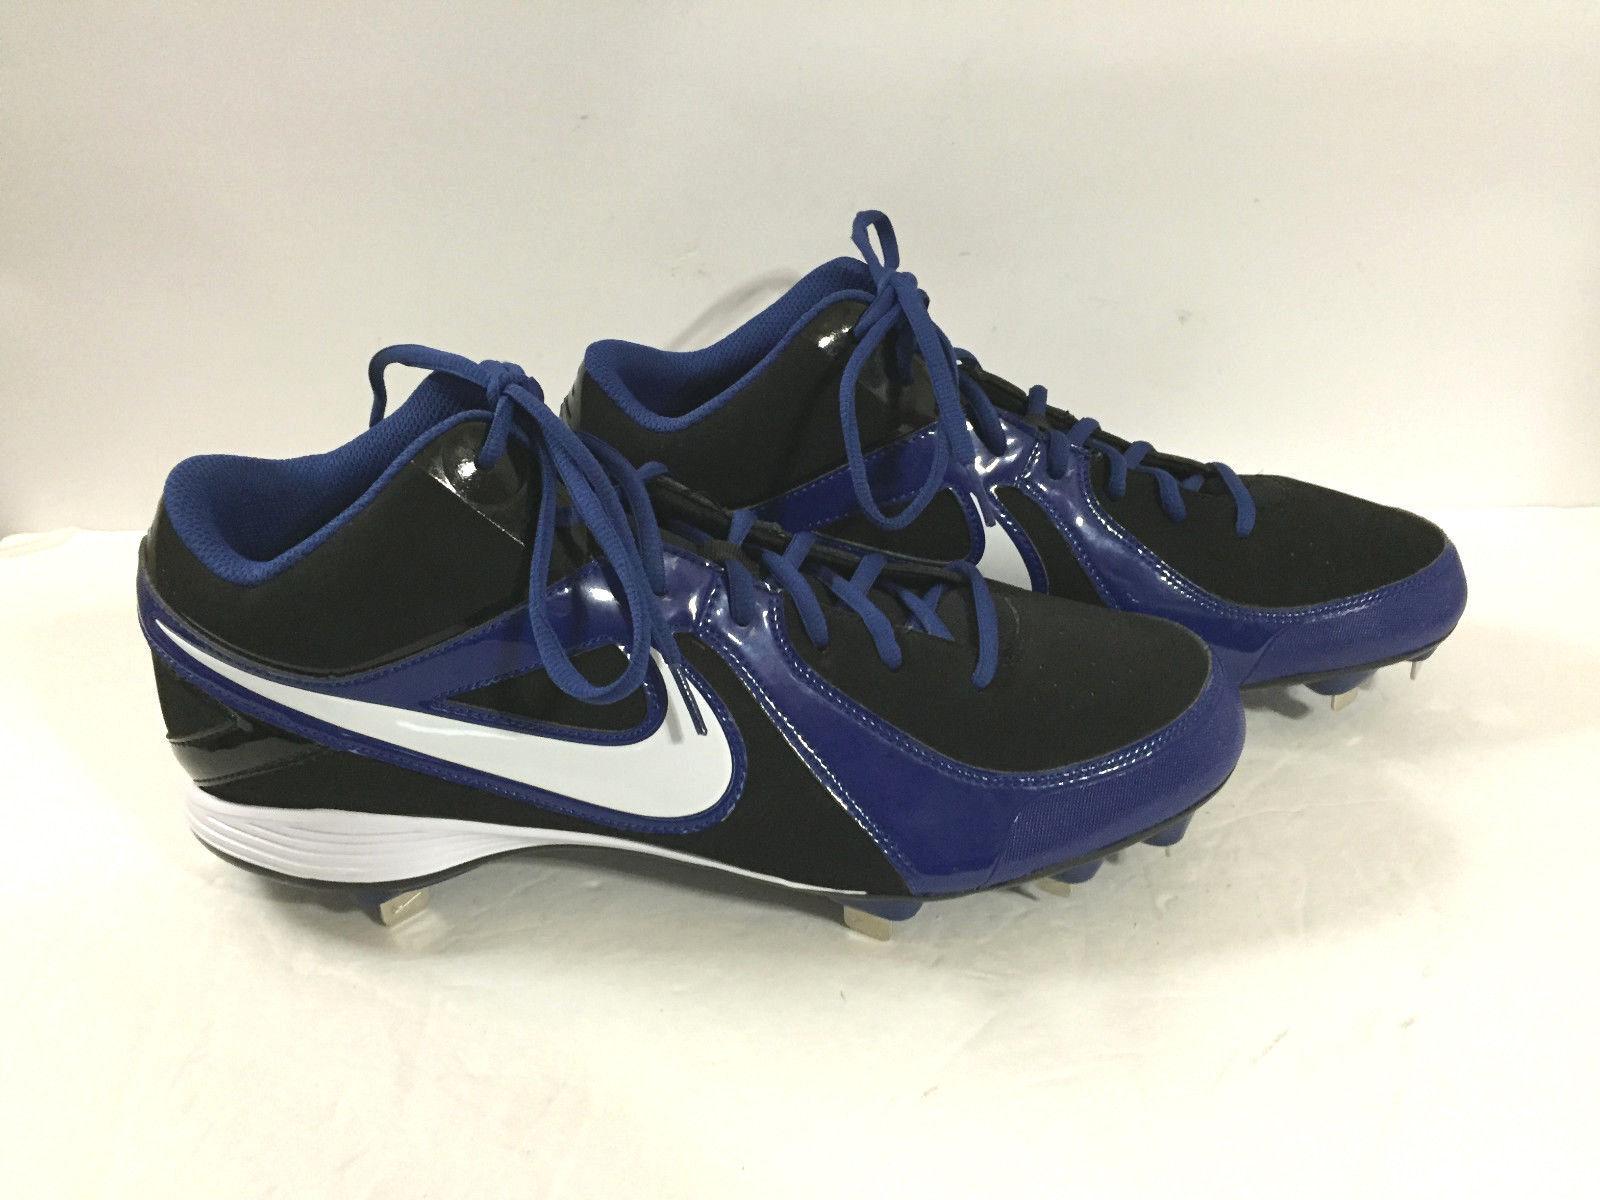 7b198ca607 Nike Men's MVP STRIKE 3/4 Metal Baseball Cleats blue black white Sz. 13 -  $34.64